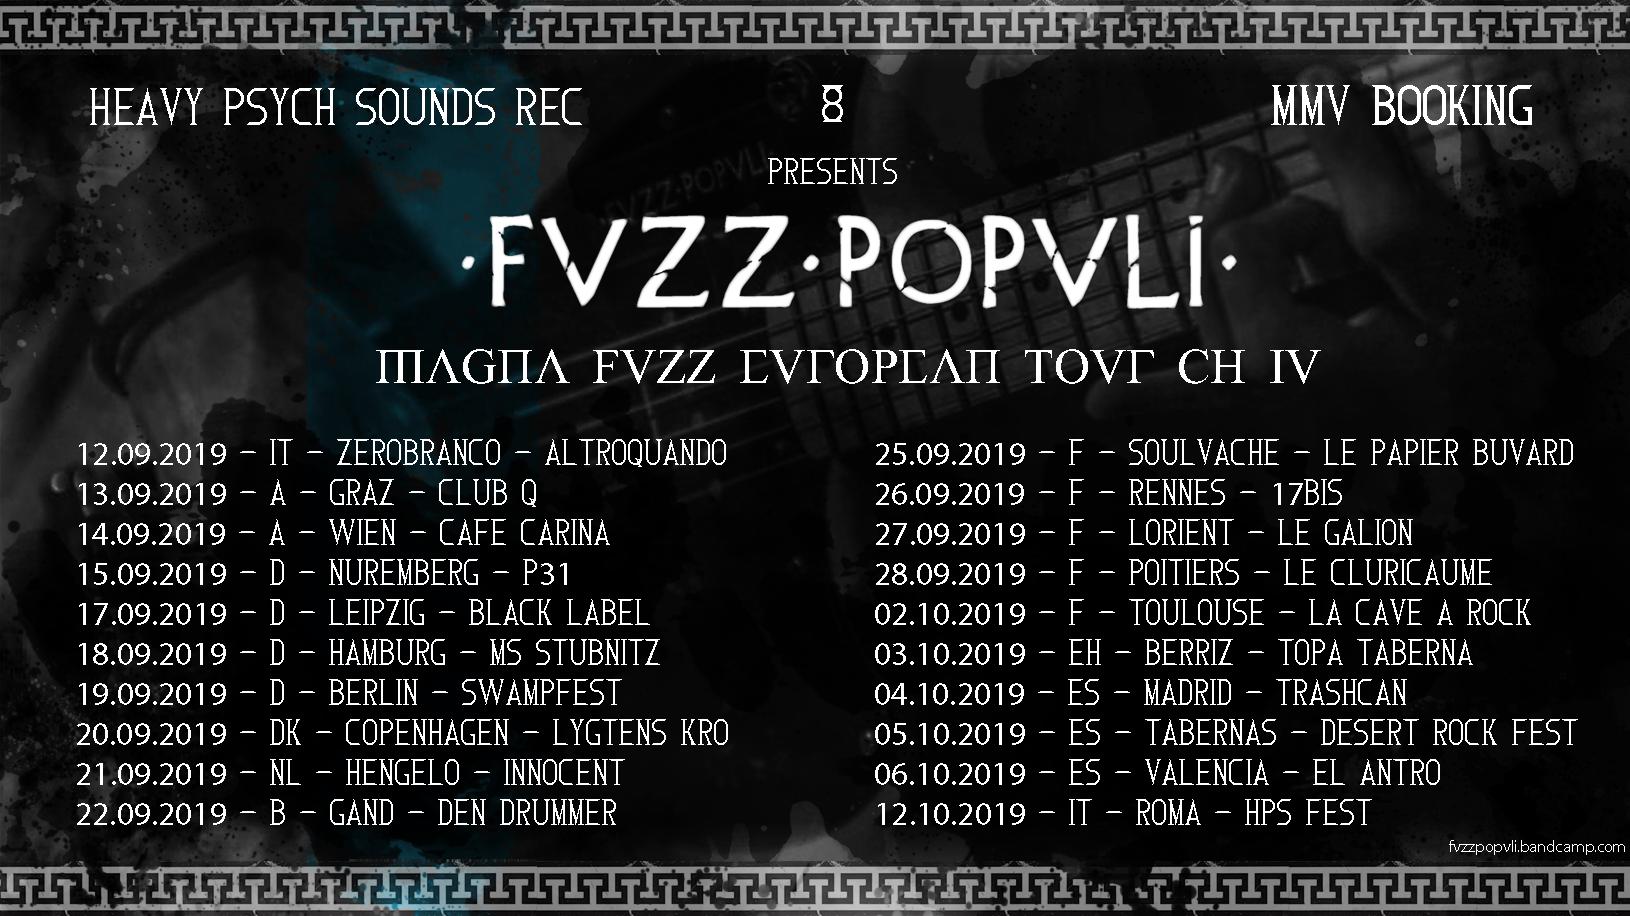 fvzz popvli tour banner